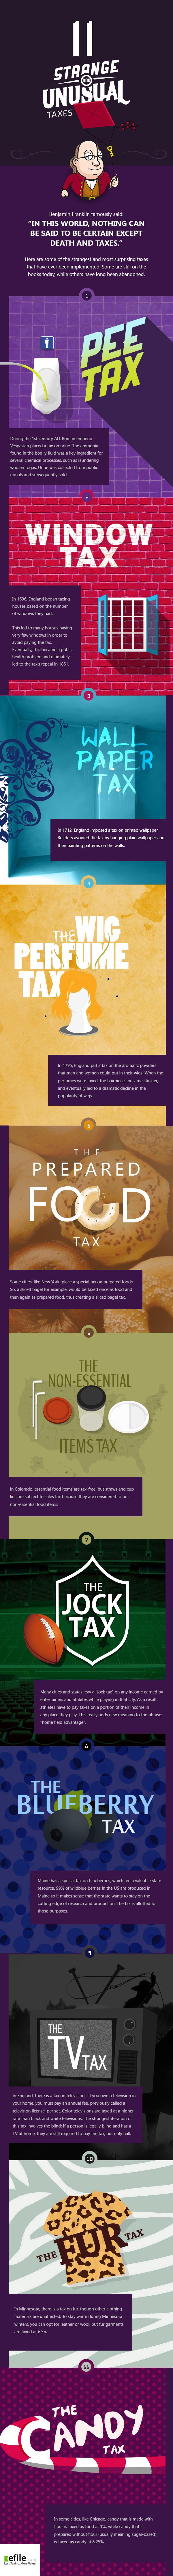 Strangest-Taxes